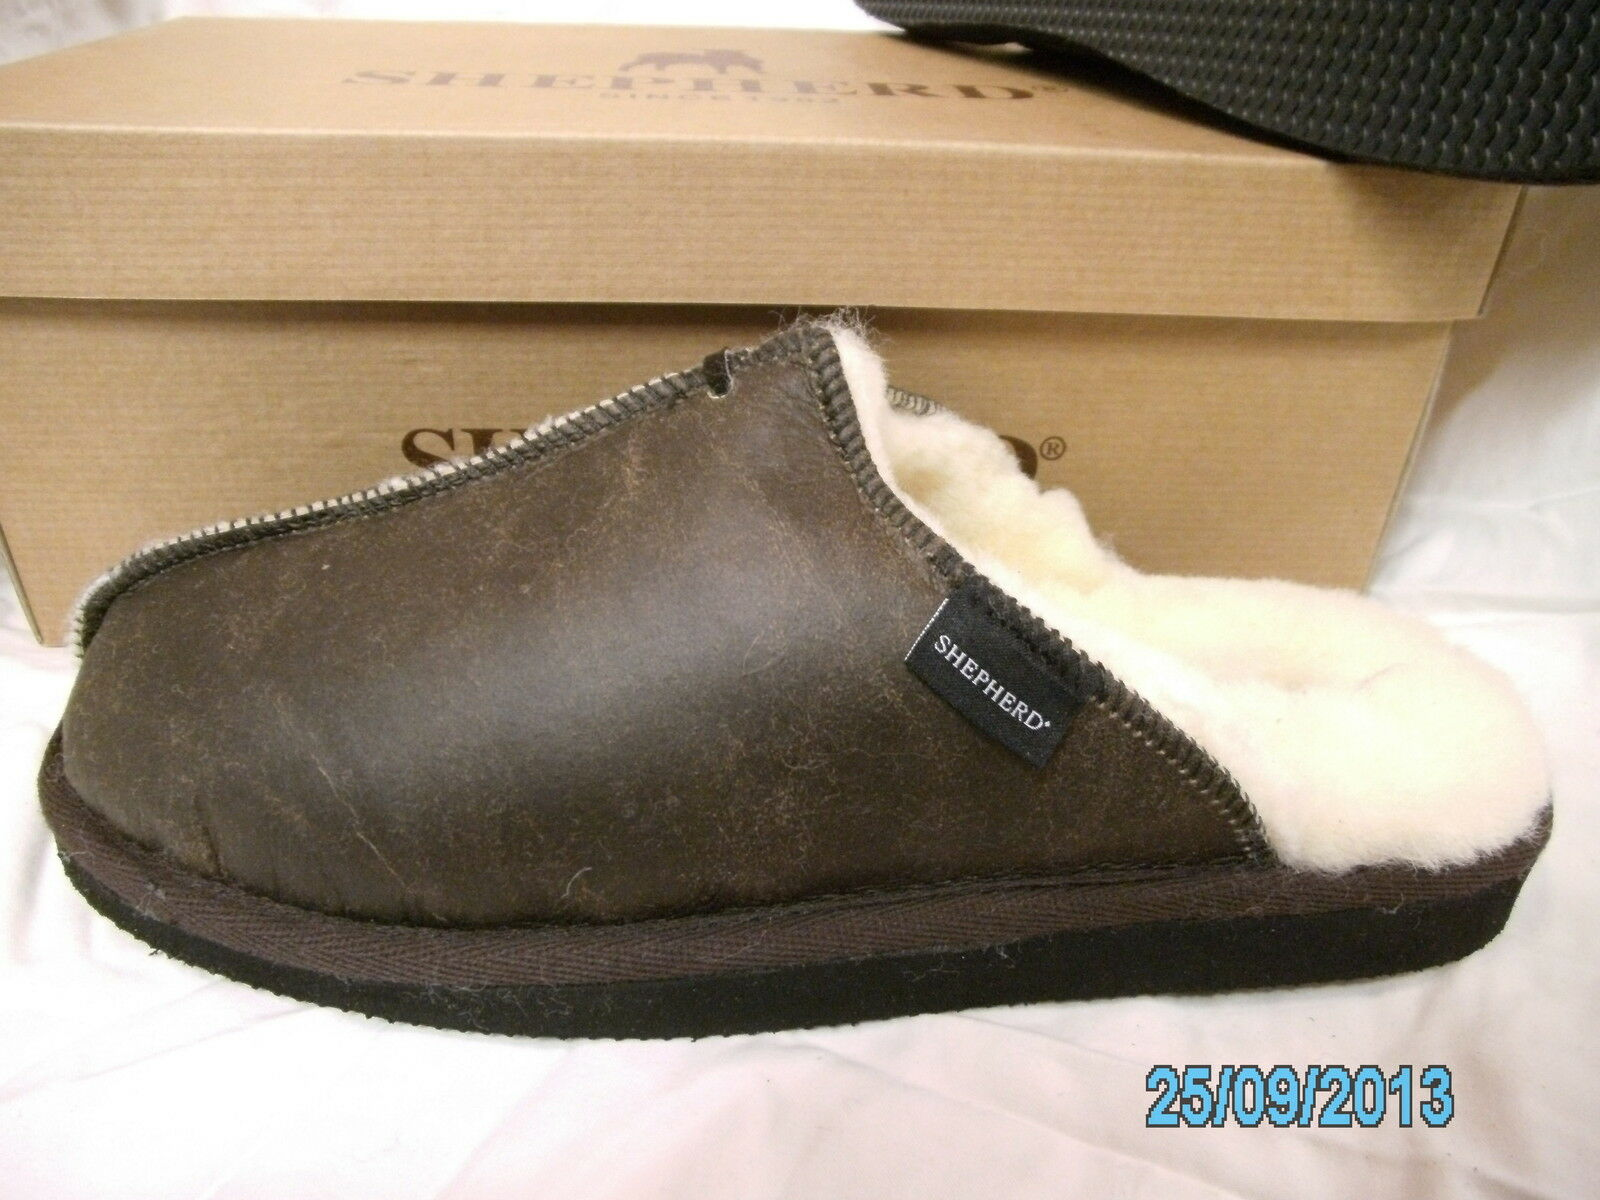 Hombre Gunuine Slippers Sheepskin Hard Sole Mule Slippers Gunuine Shepherd